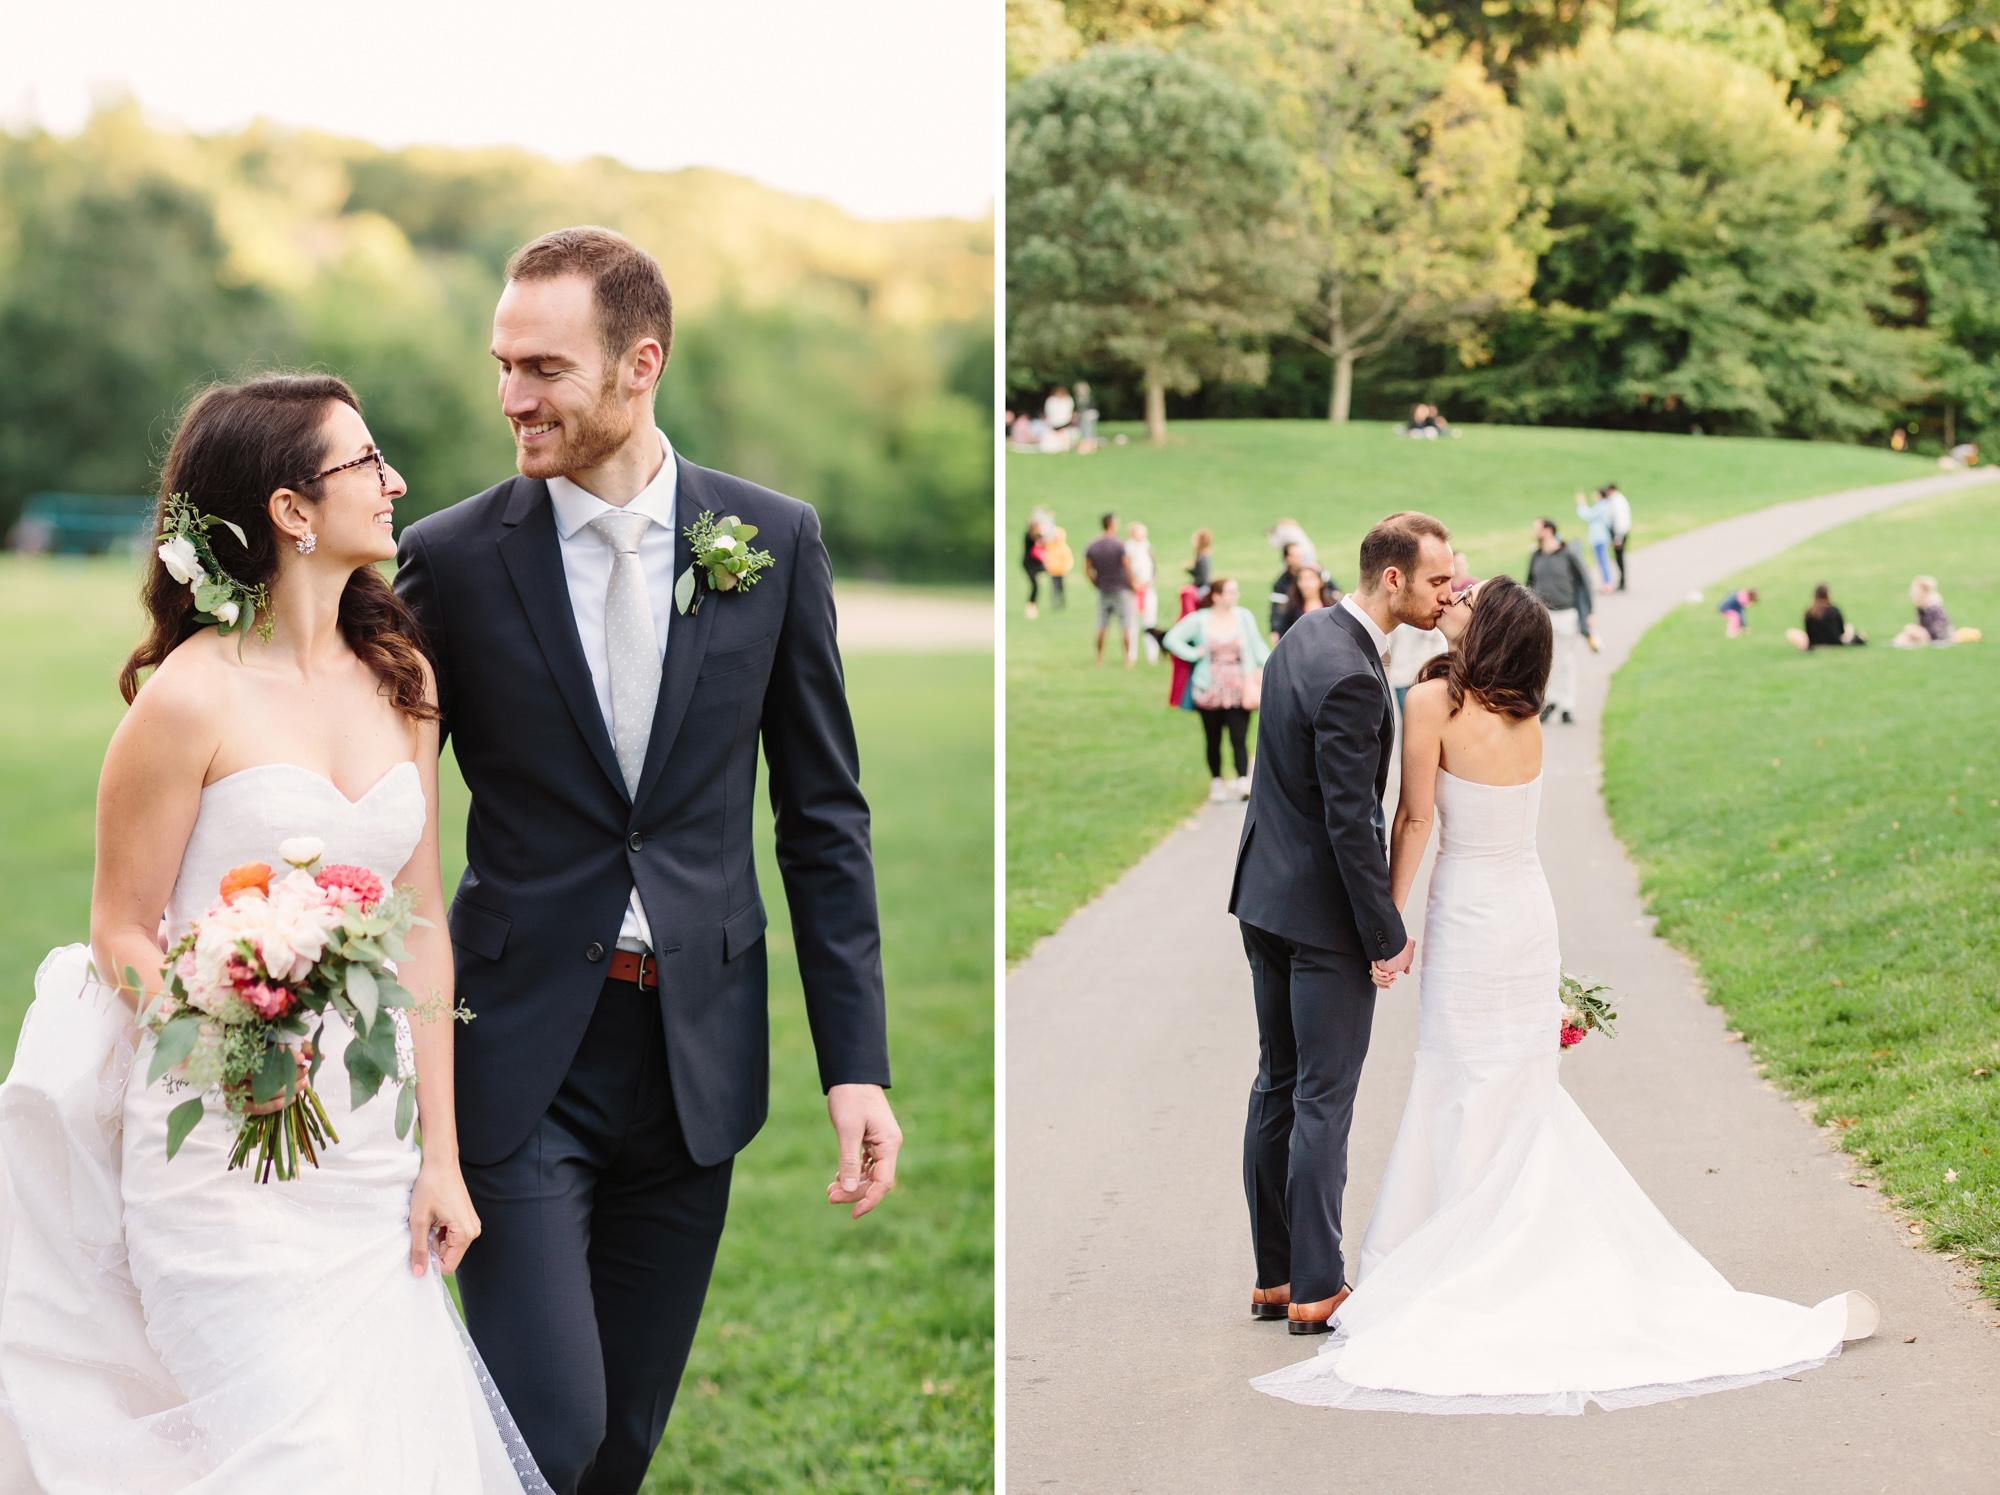 33_Kate_Sam_Picnic_House_Wedding_Brooklyn_NY_Tanya_Salazar_Photography.jpg